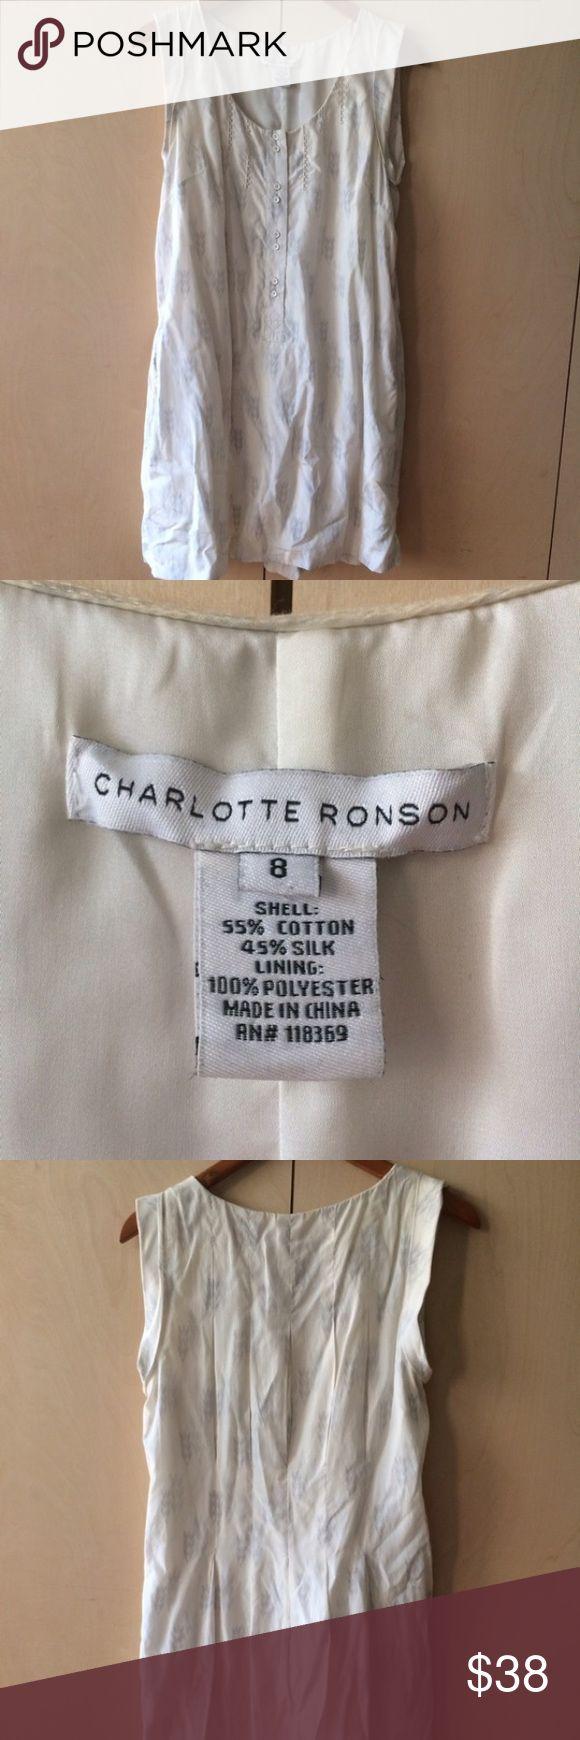 Charlotte Ronson Tank Dress size 8 silk & cotton Charlotte Ronson Tank Dress size 8 silk & cotton 2 side pockets. Loops for belt. Charlotte Ronson Dresses Mini